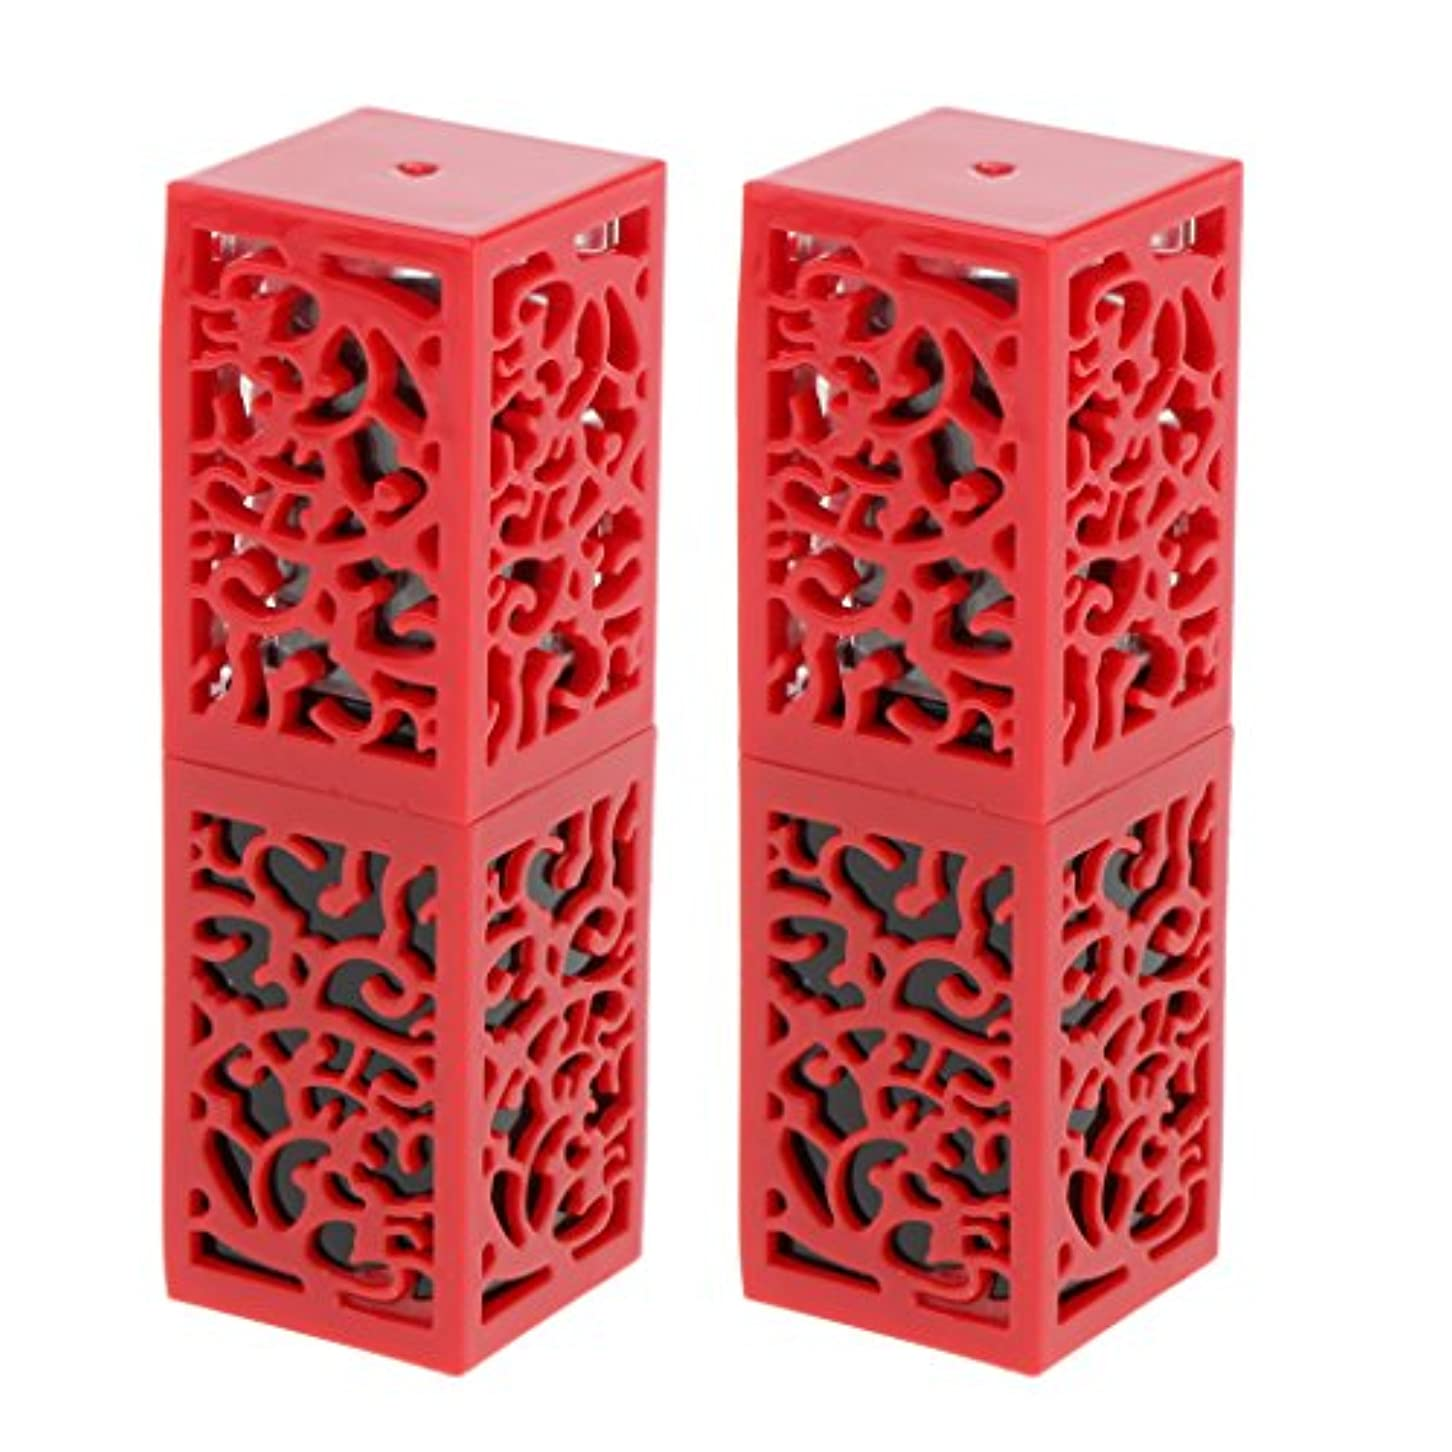 Perfk 2個入 口紅チューブ リップスティックチューブ 内径1.21cm 金型 コスメ 化粧品 DIY 全2色 - 赤